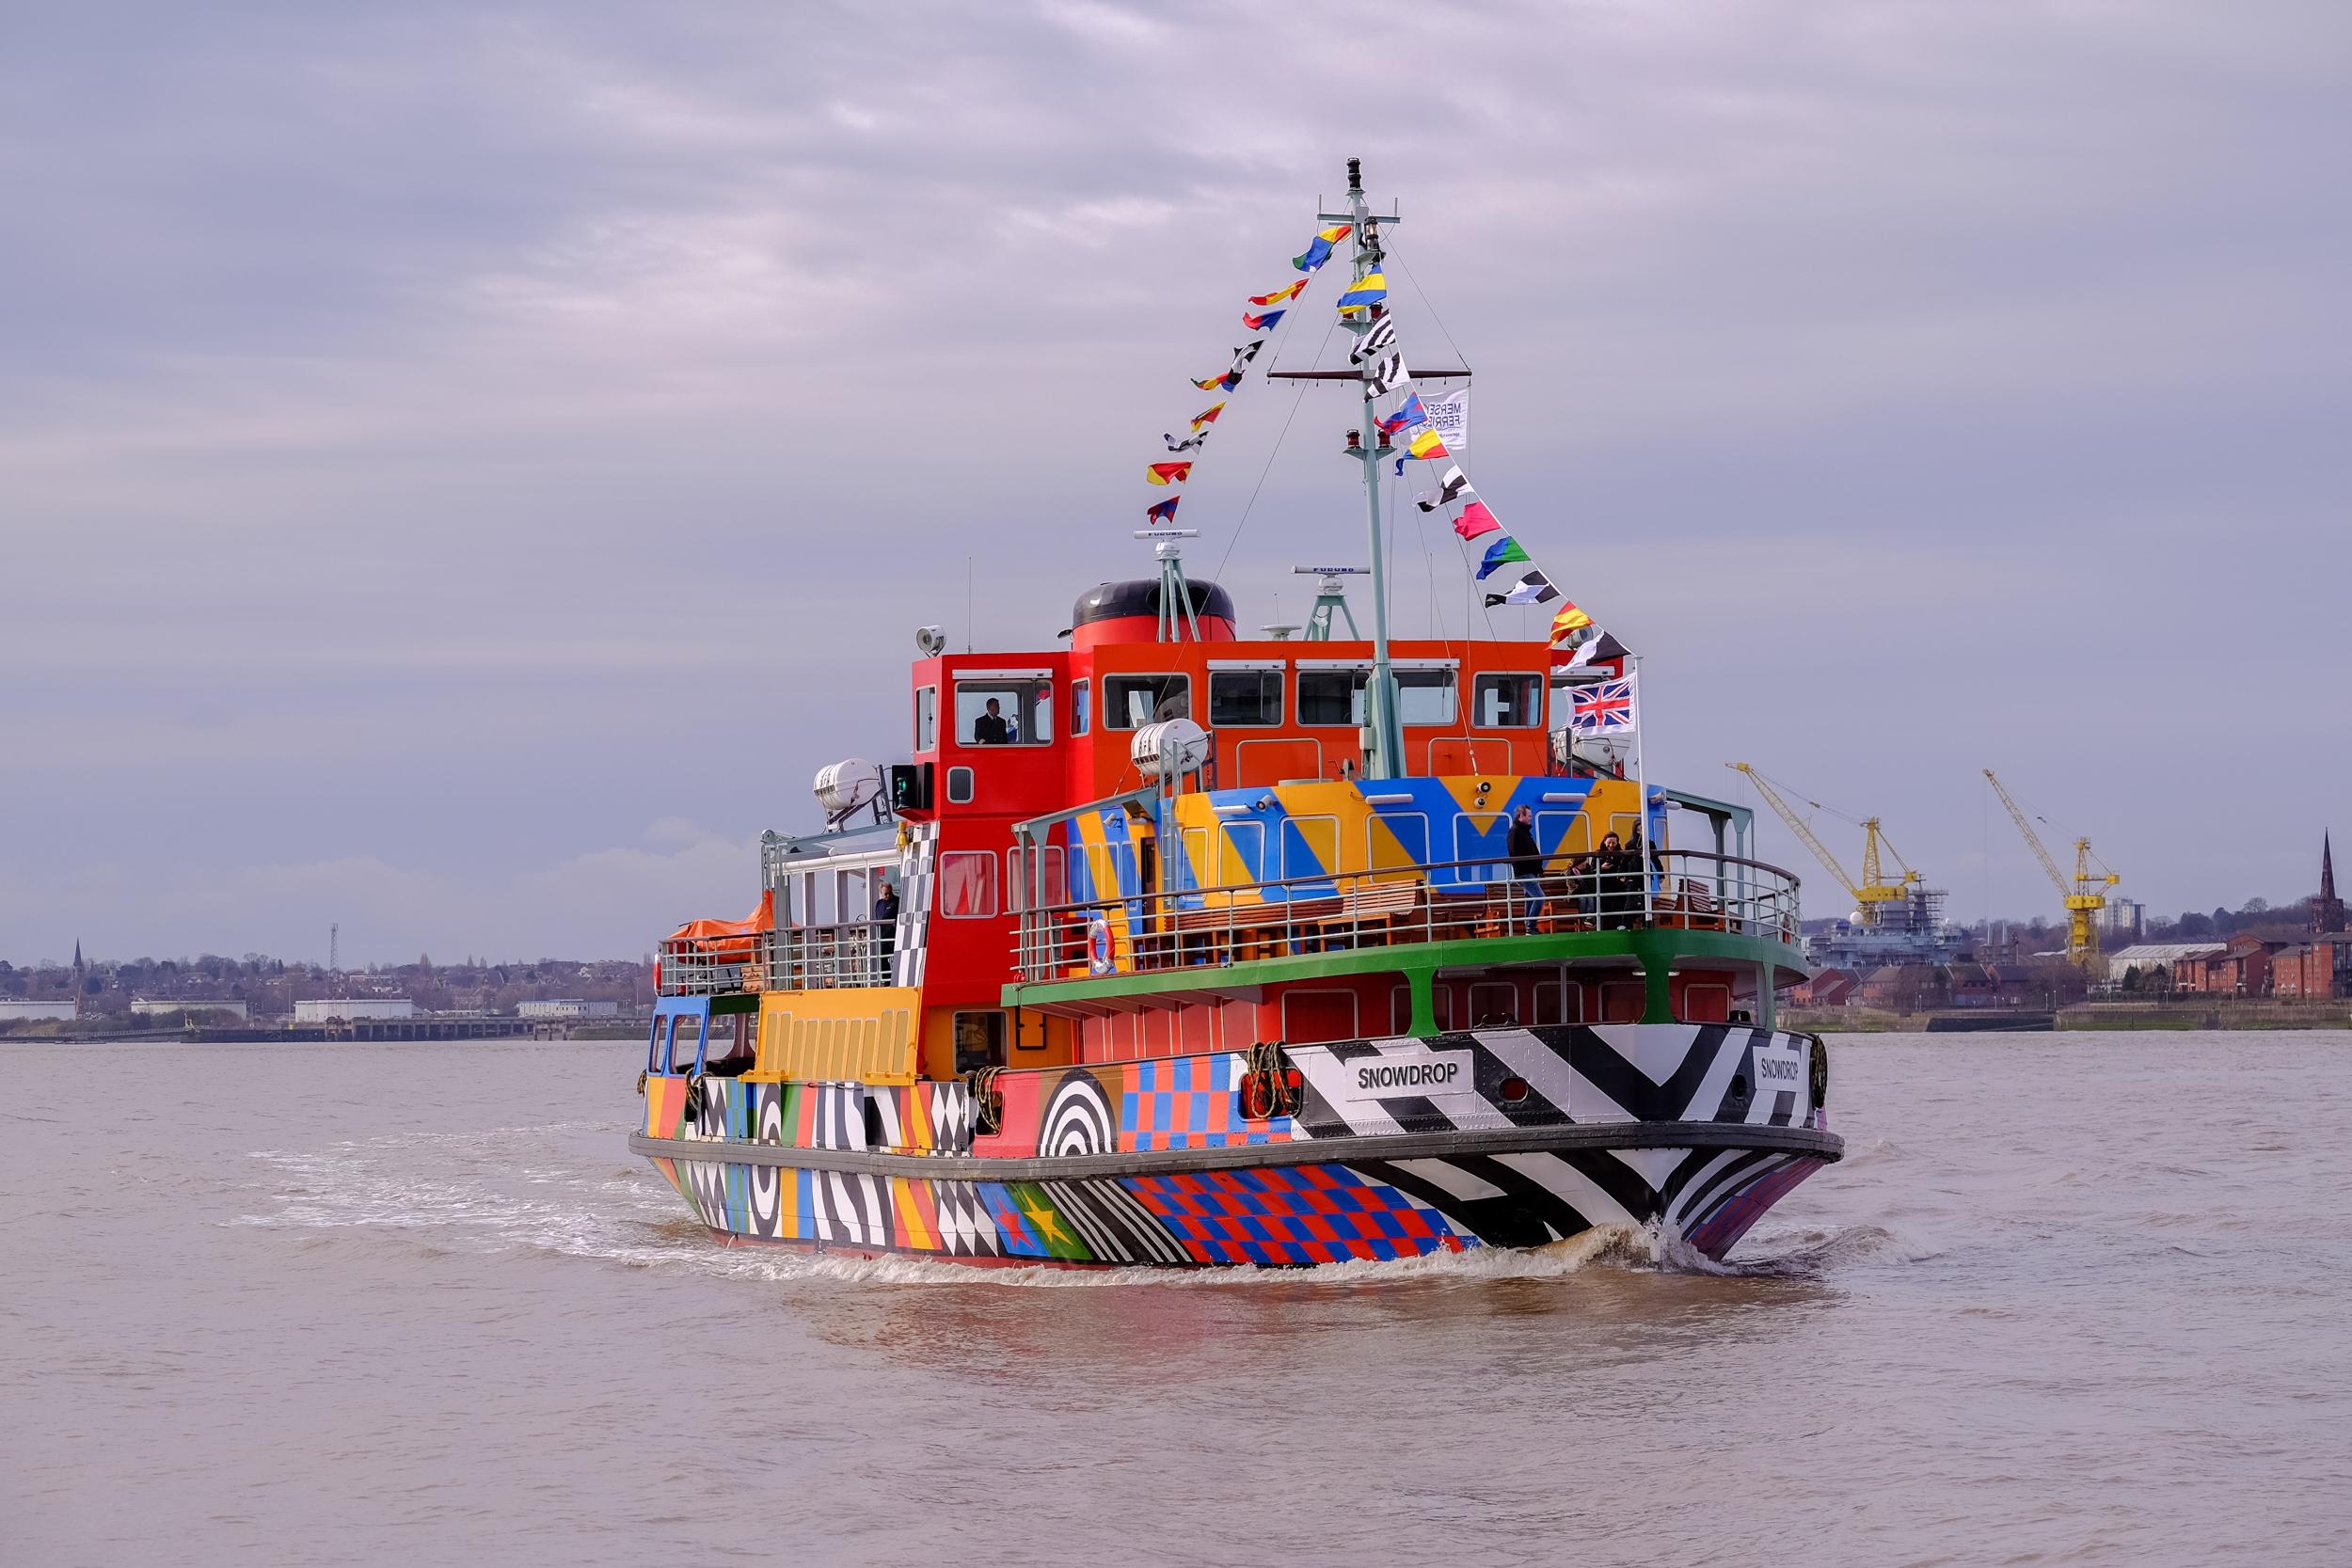 Dazzle Ferry Mersey, Everybody Razzle Dazzle, Sir Peter Blake, 2015. Image credit - Mark McNulty